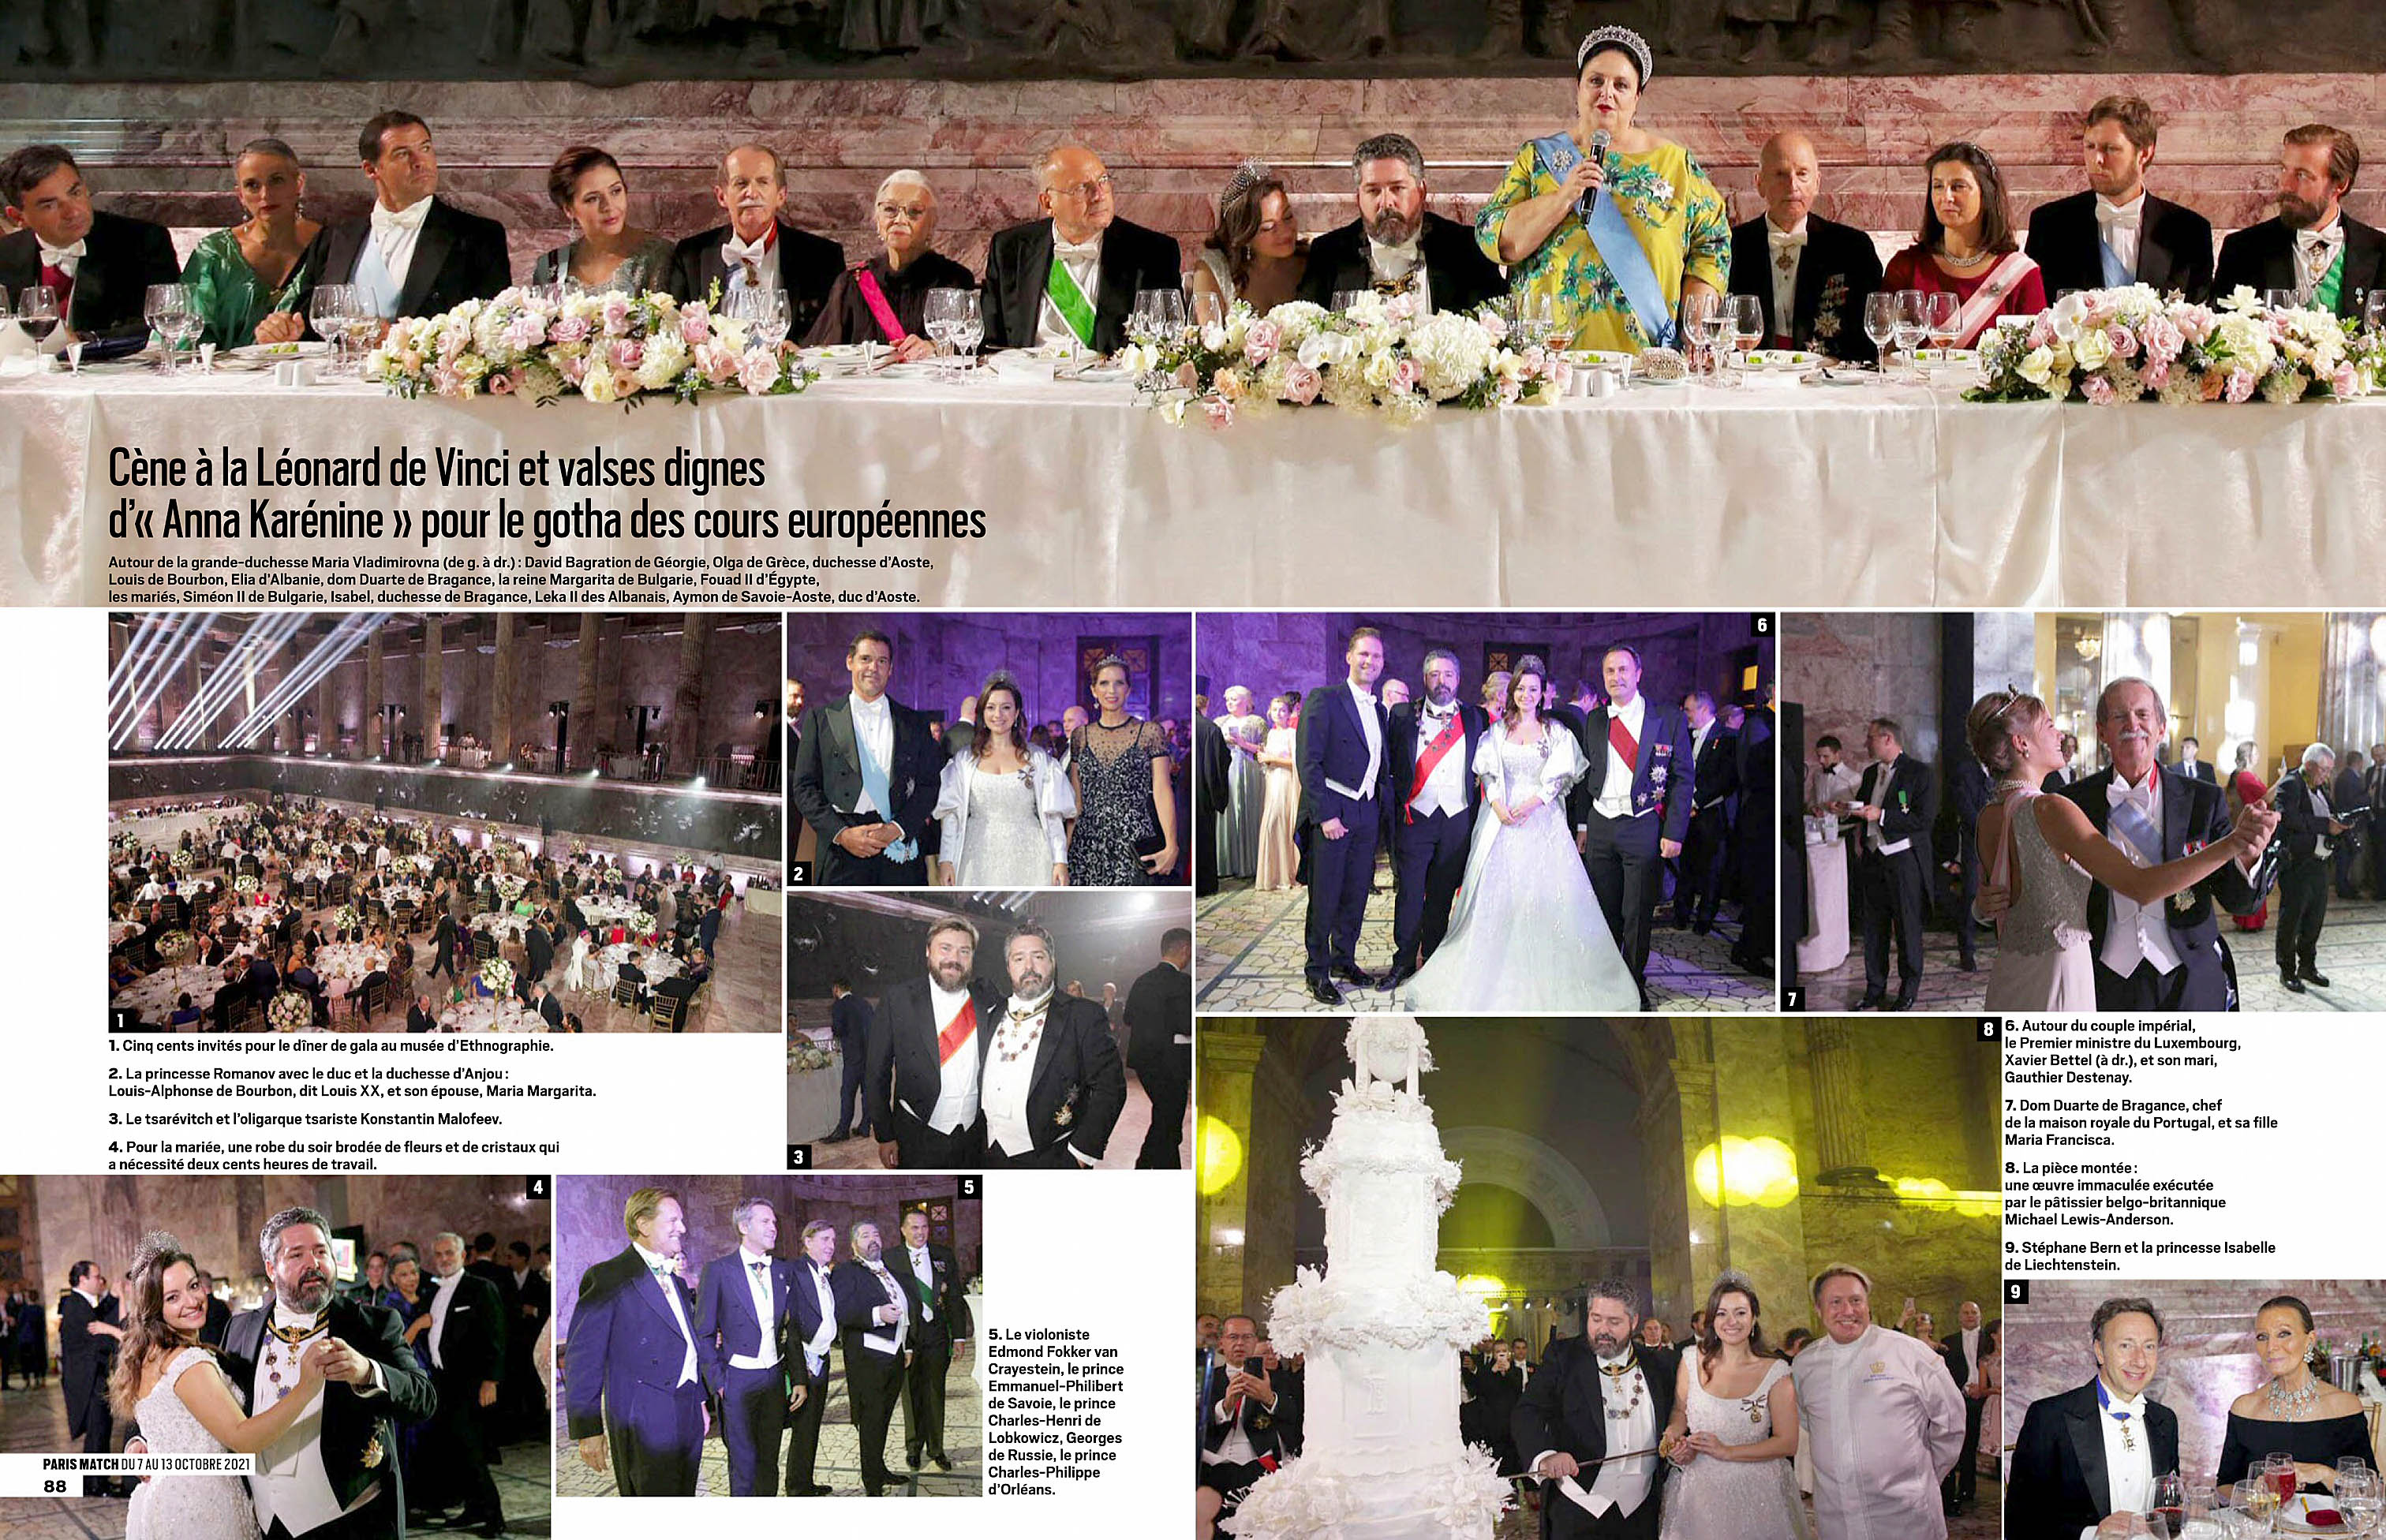 Paris Match 211007 Rus Royal 04.jpg